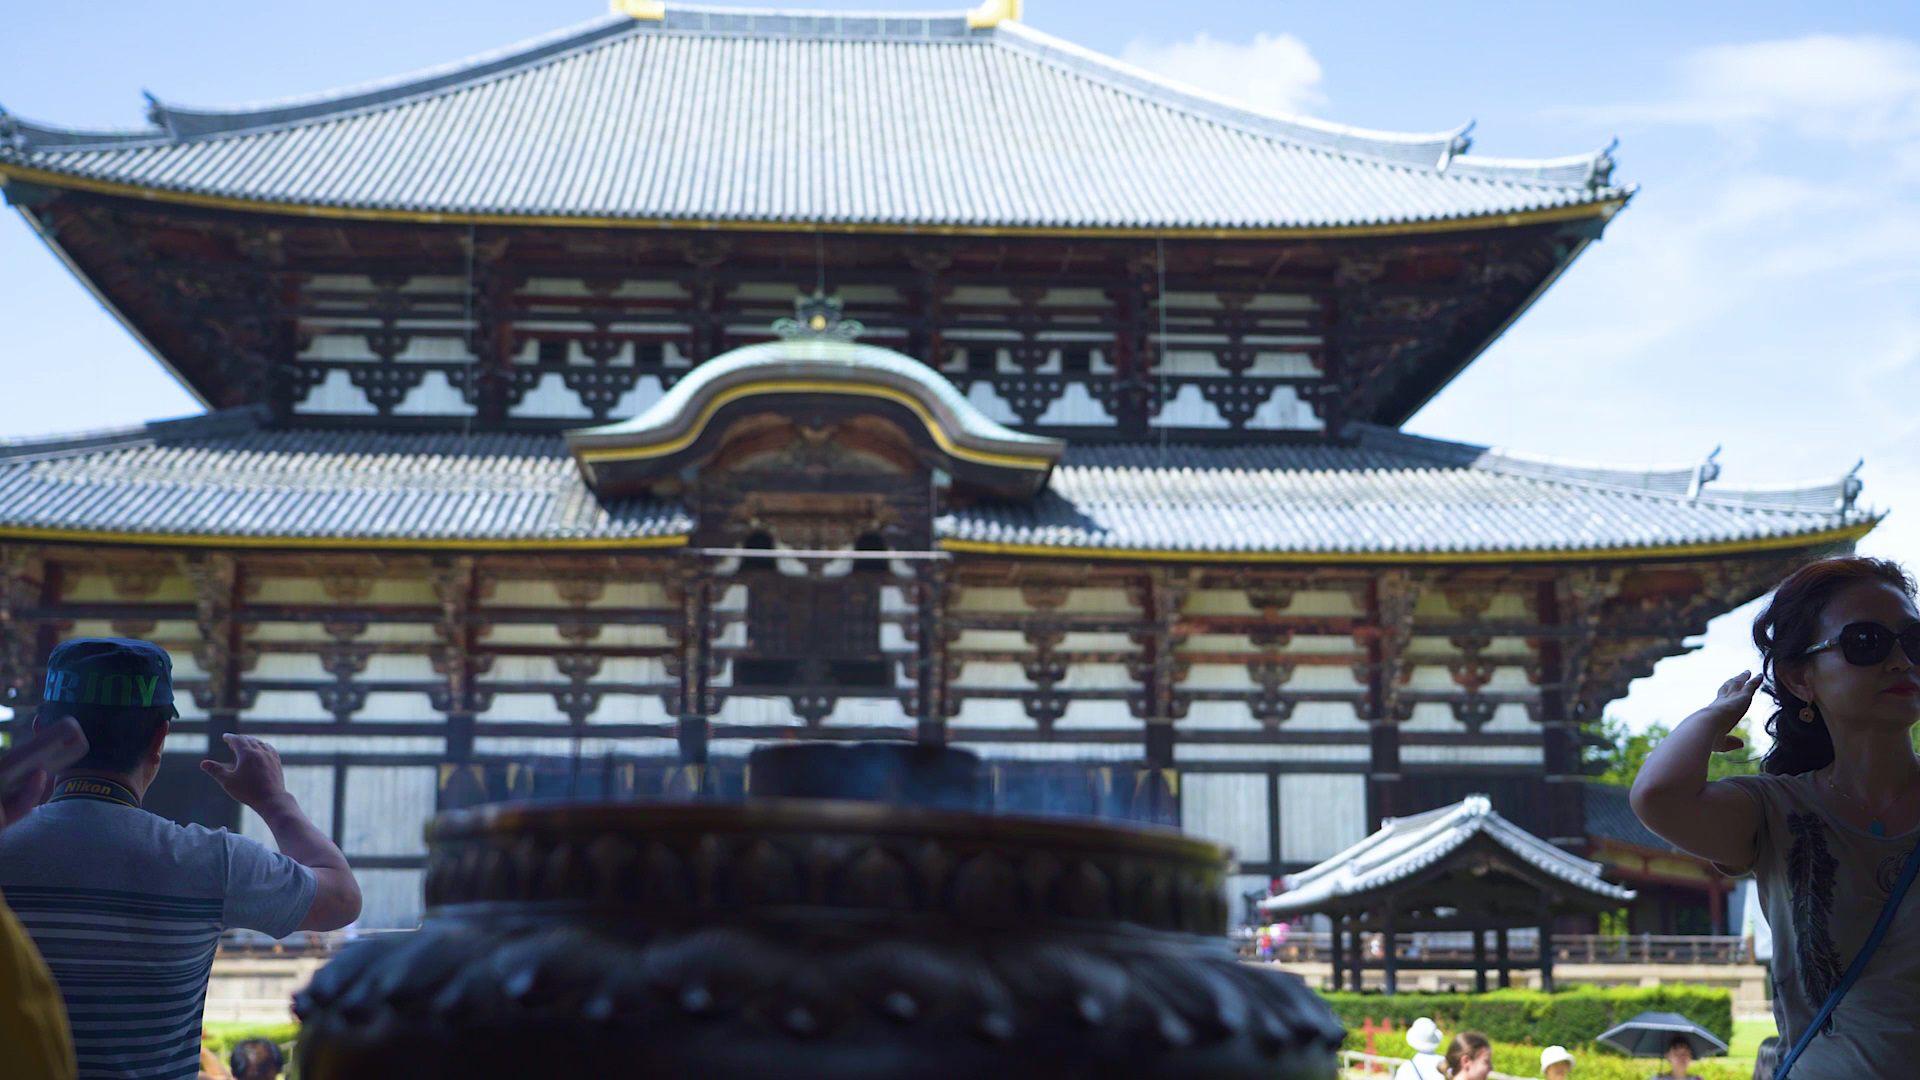 The Impressive Great Buddha Hall at Todai-ji Temple